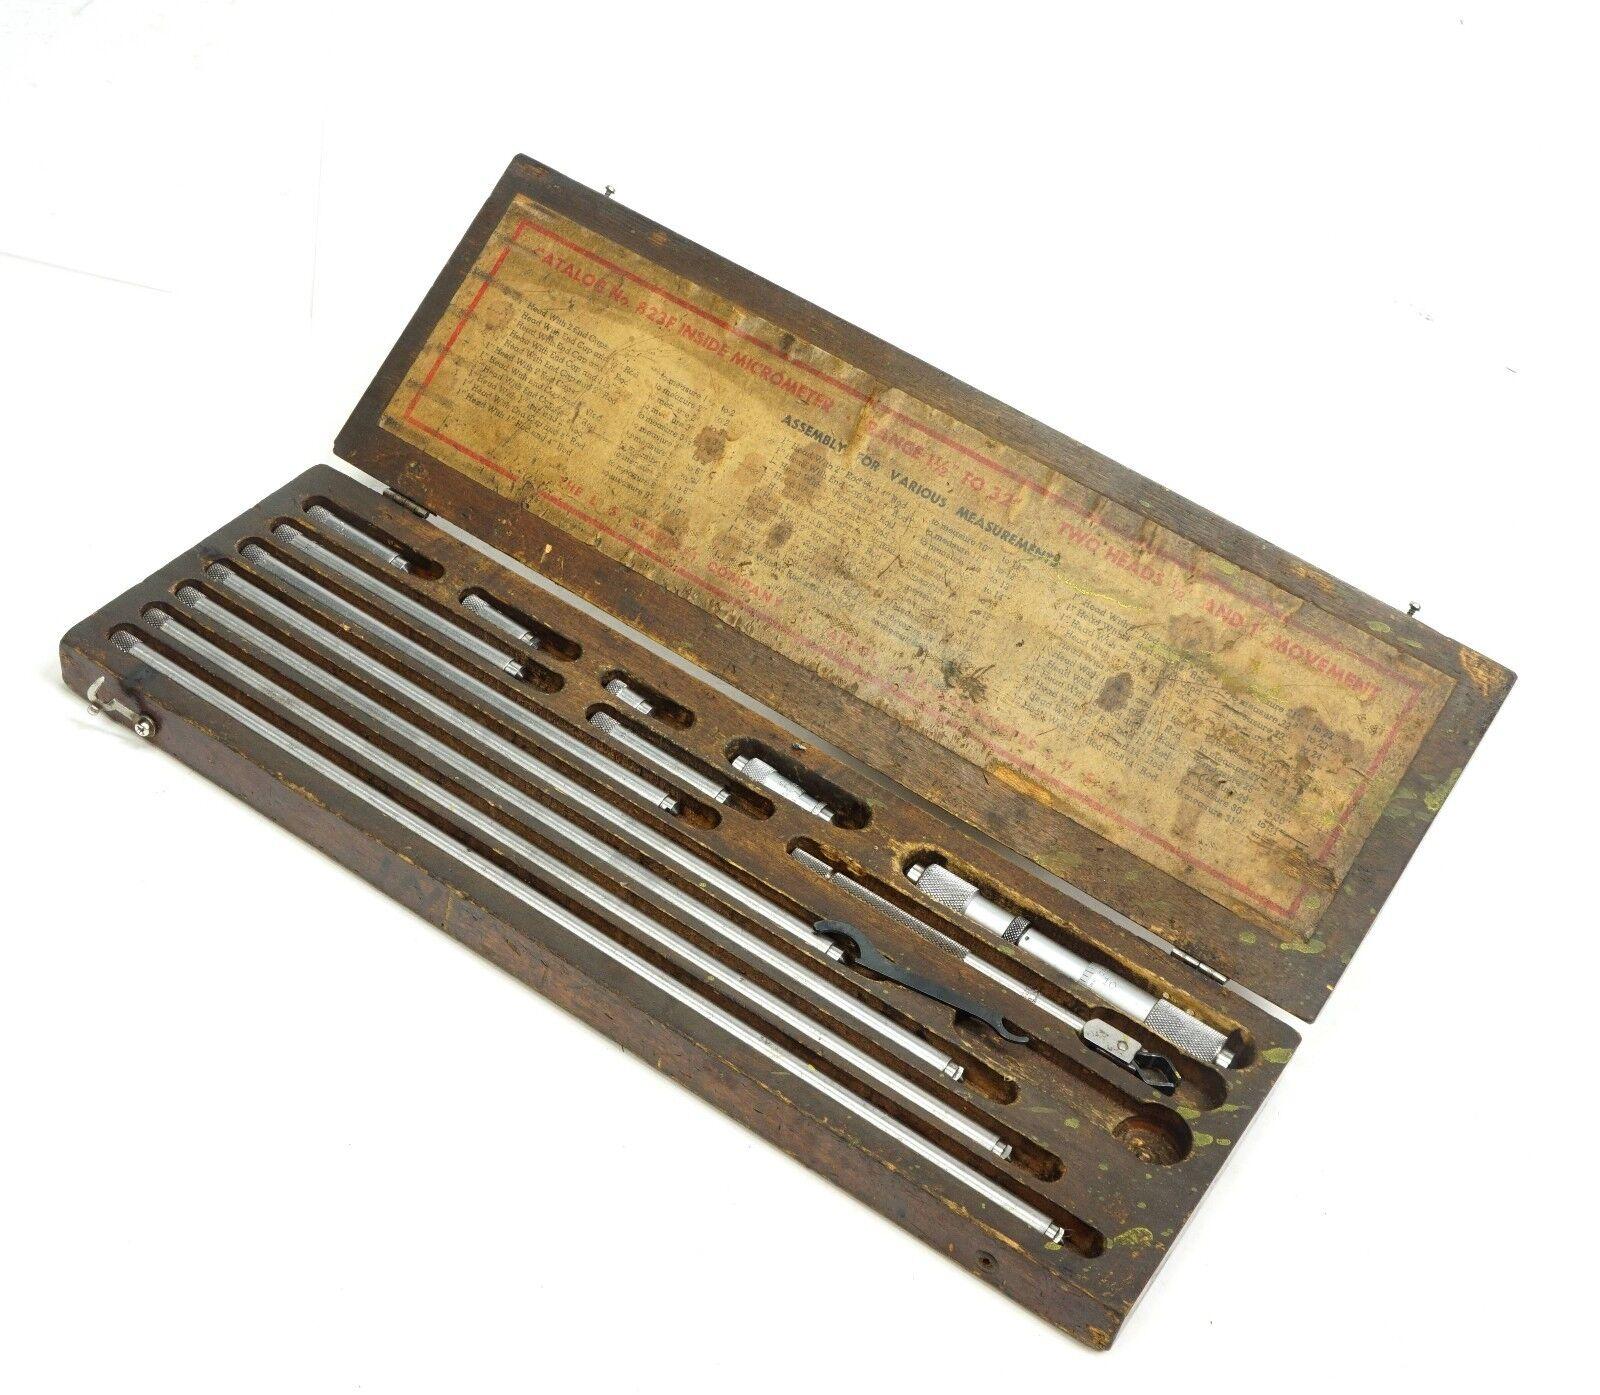 starrett micrometer, tubular micrometer, 823F